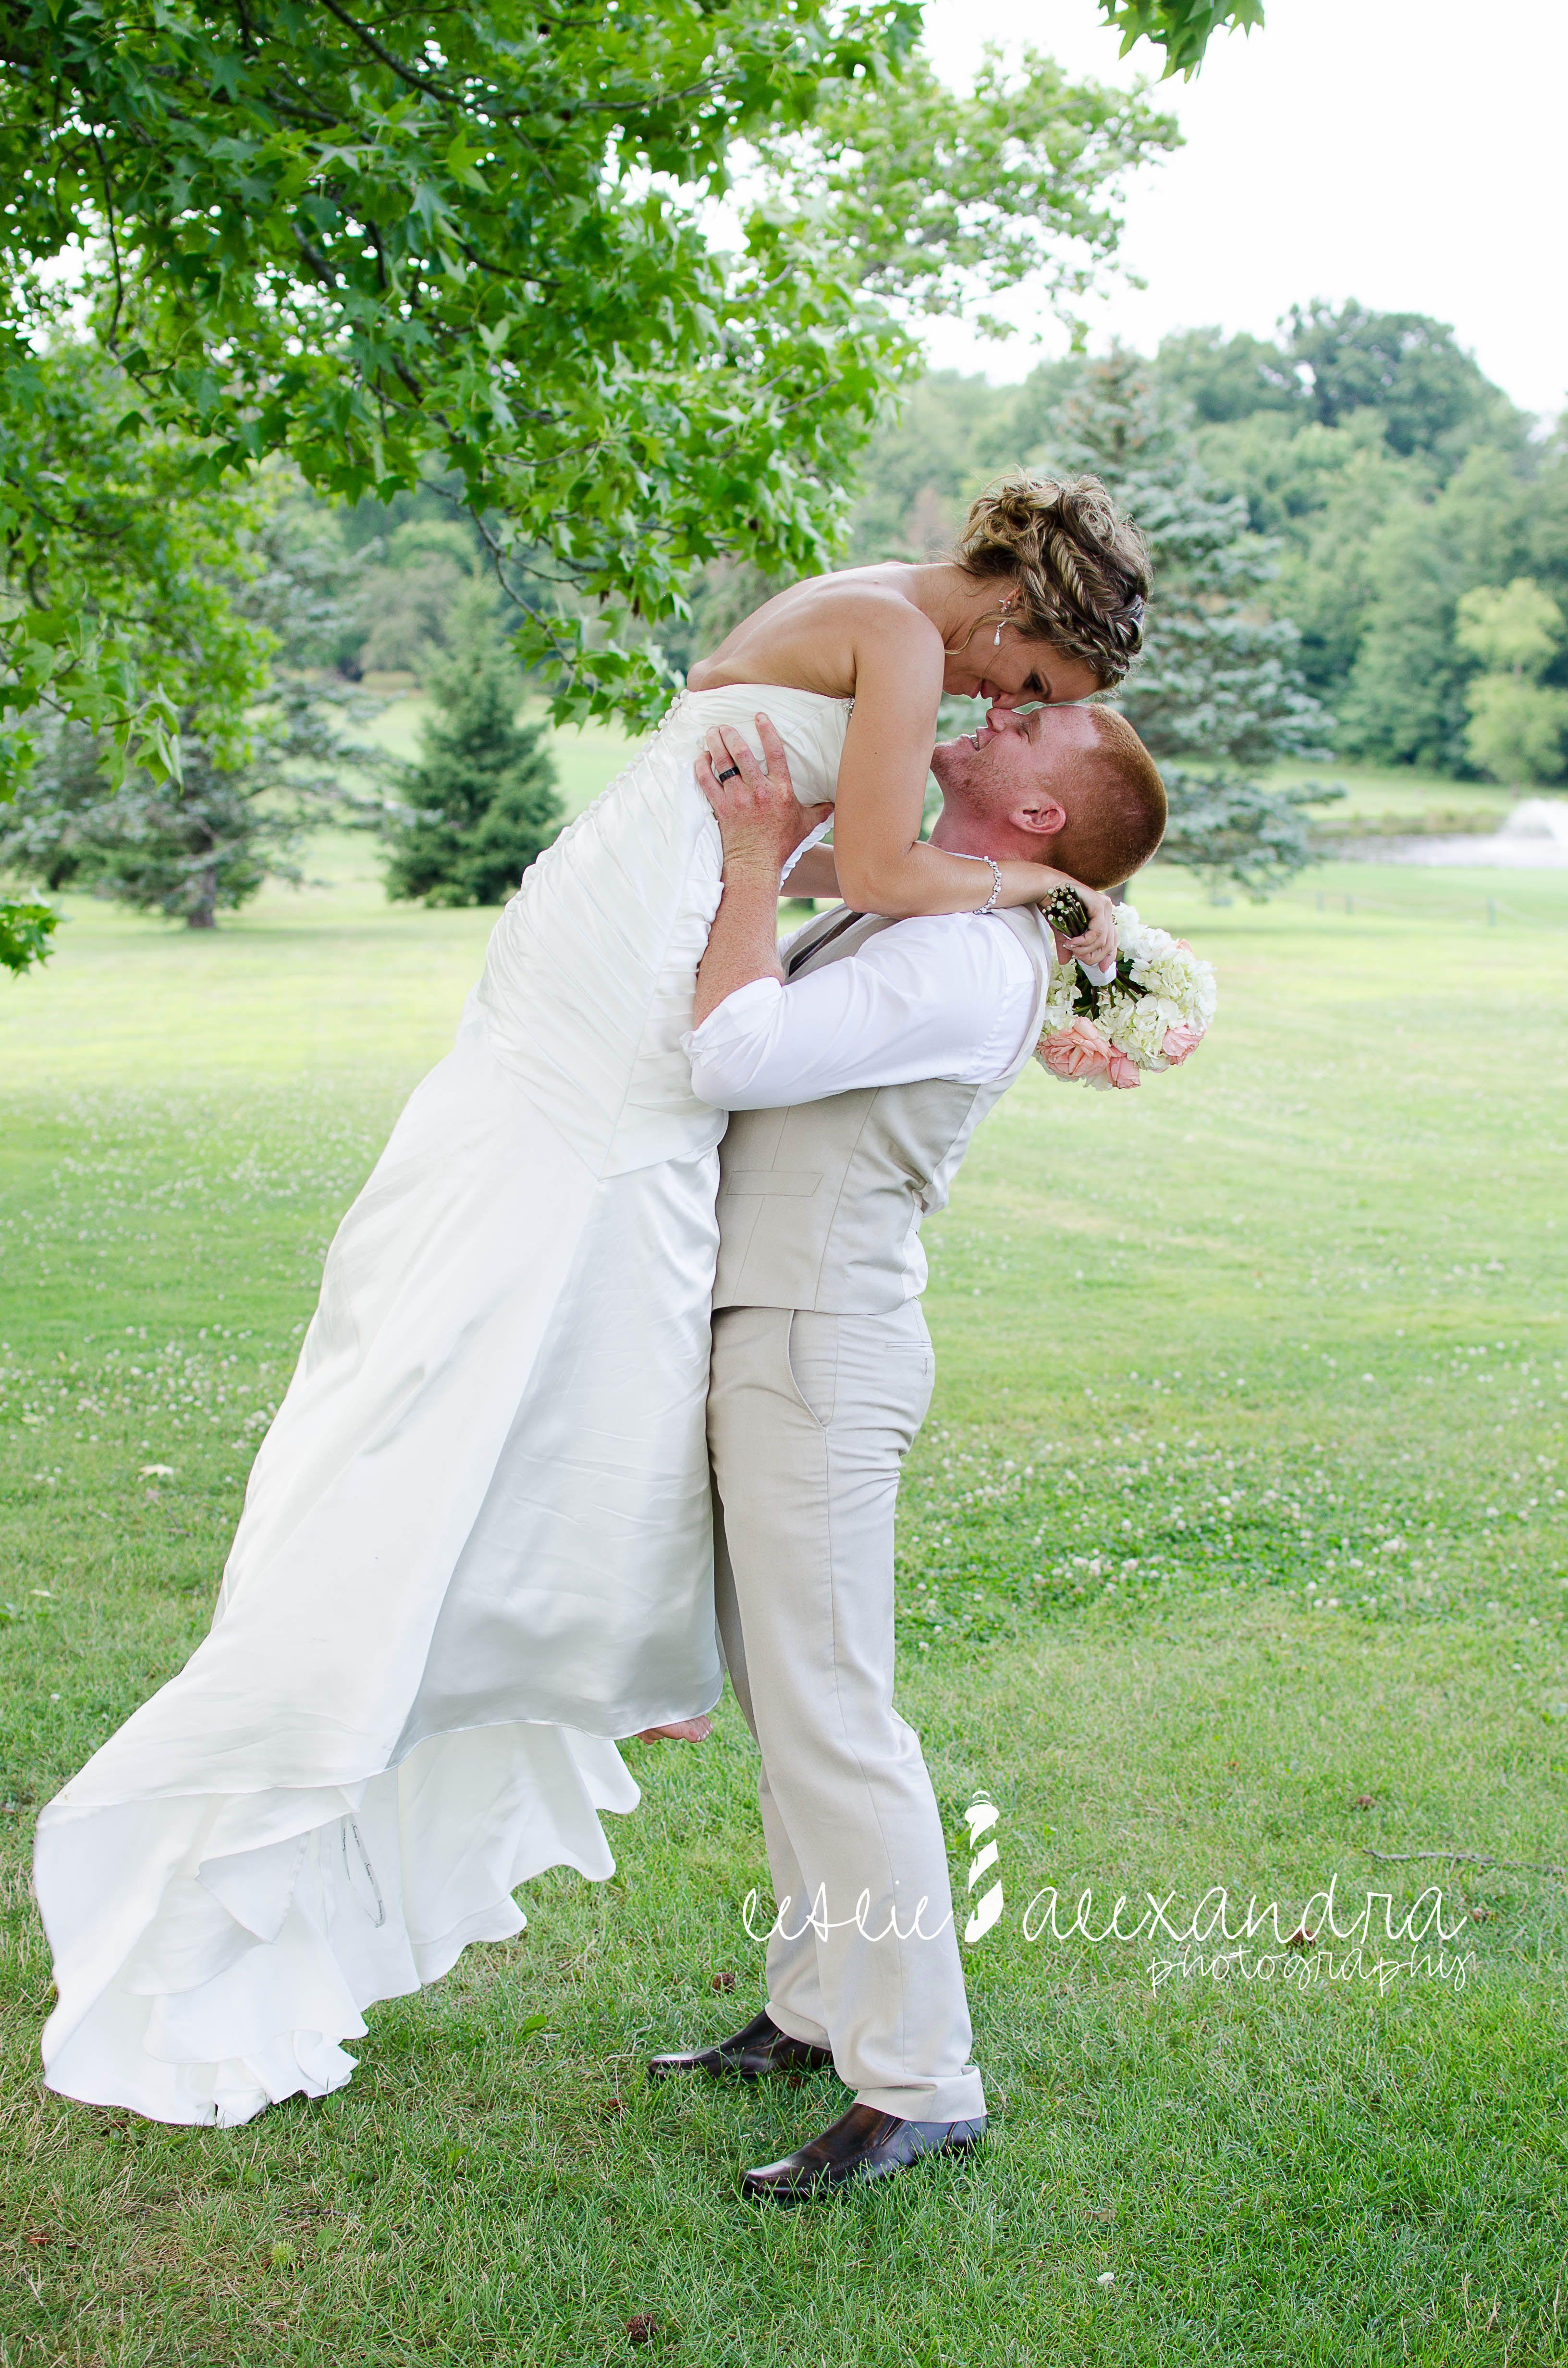 065e41c1a3c Jenna   TJ www.lesliealexandraphotography.com · Wedding Photography